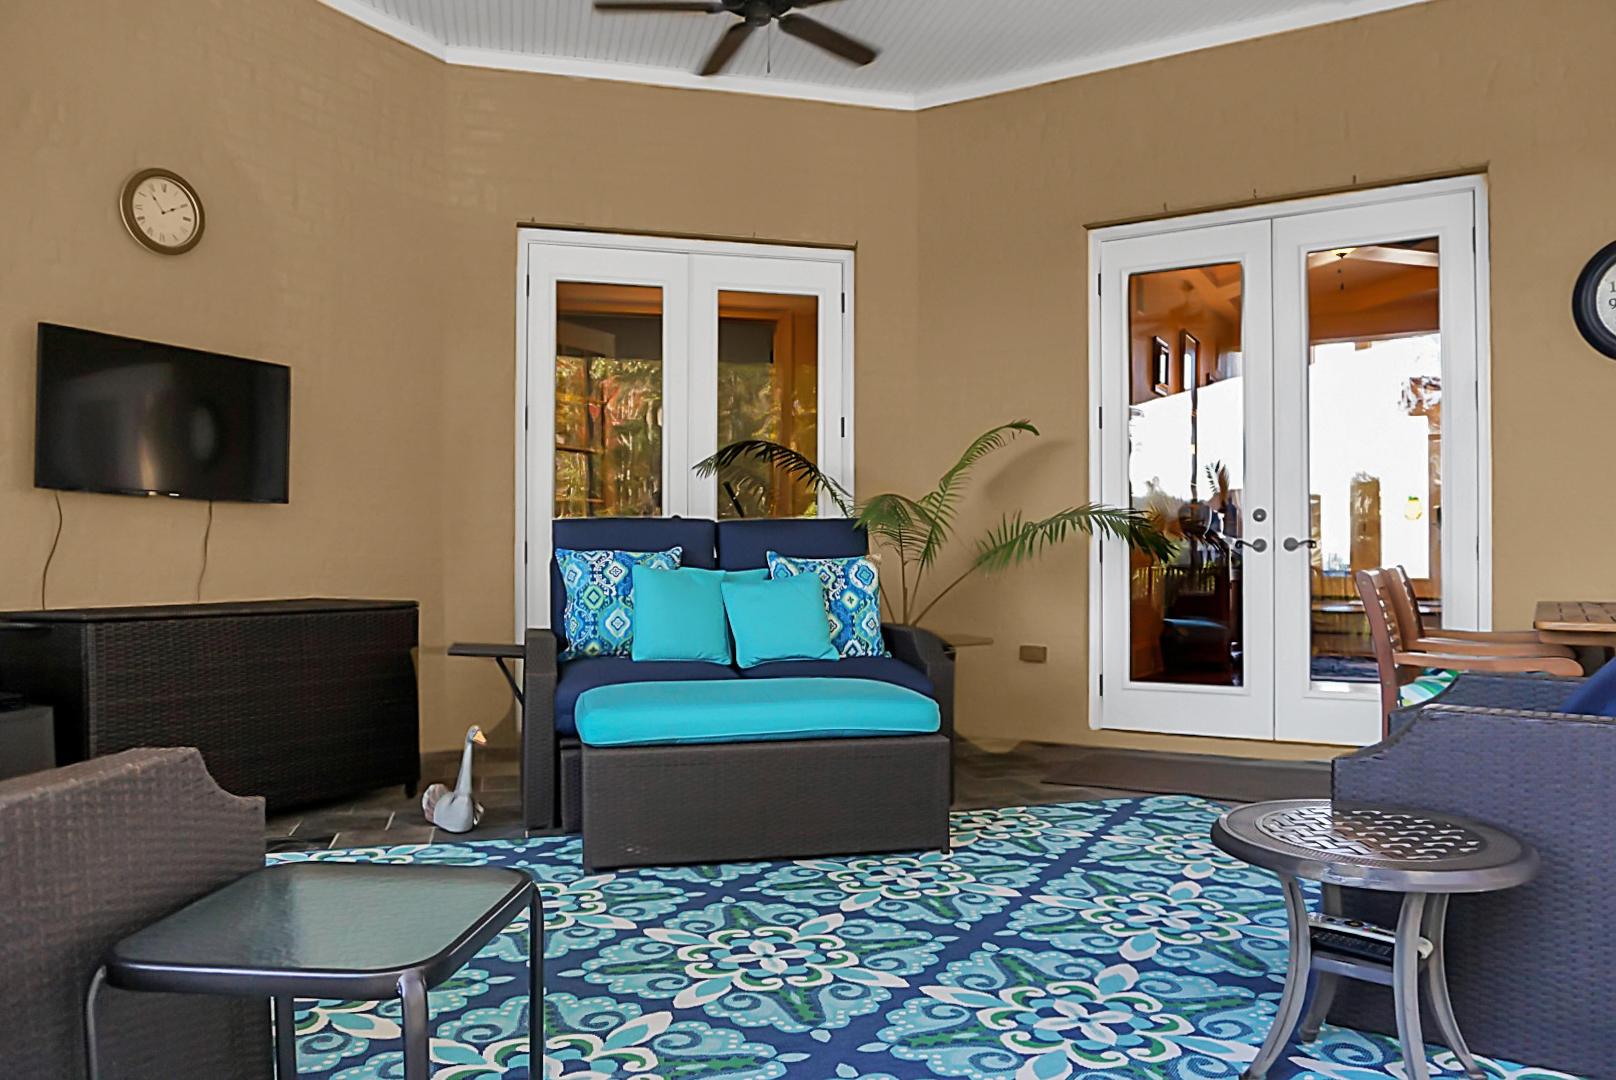 Dunes West Homes For Sale - 2389 Darts Cove, Mount Pleasant, SC - 13